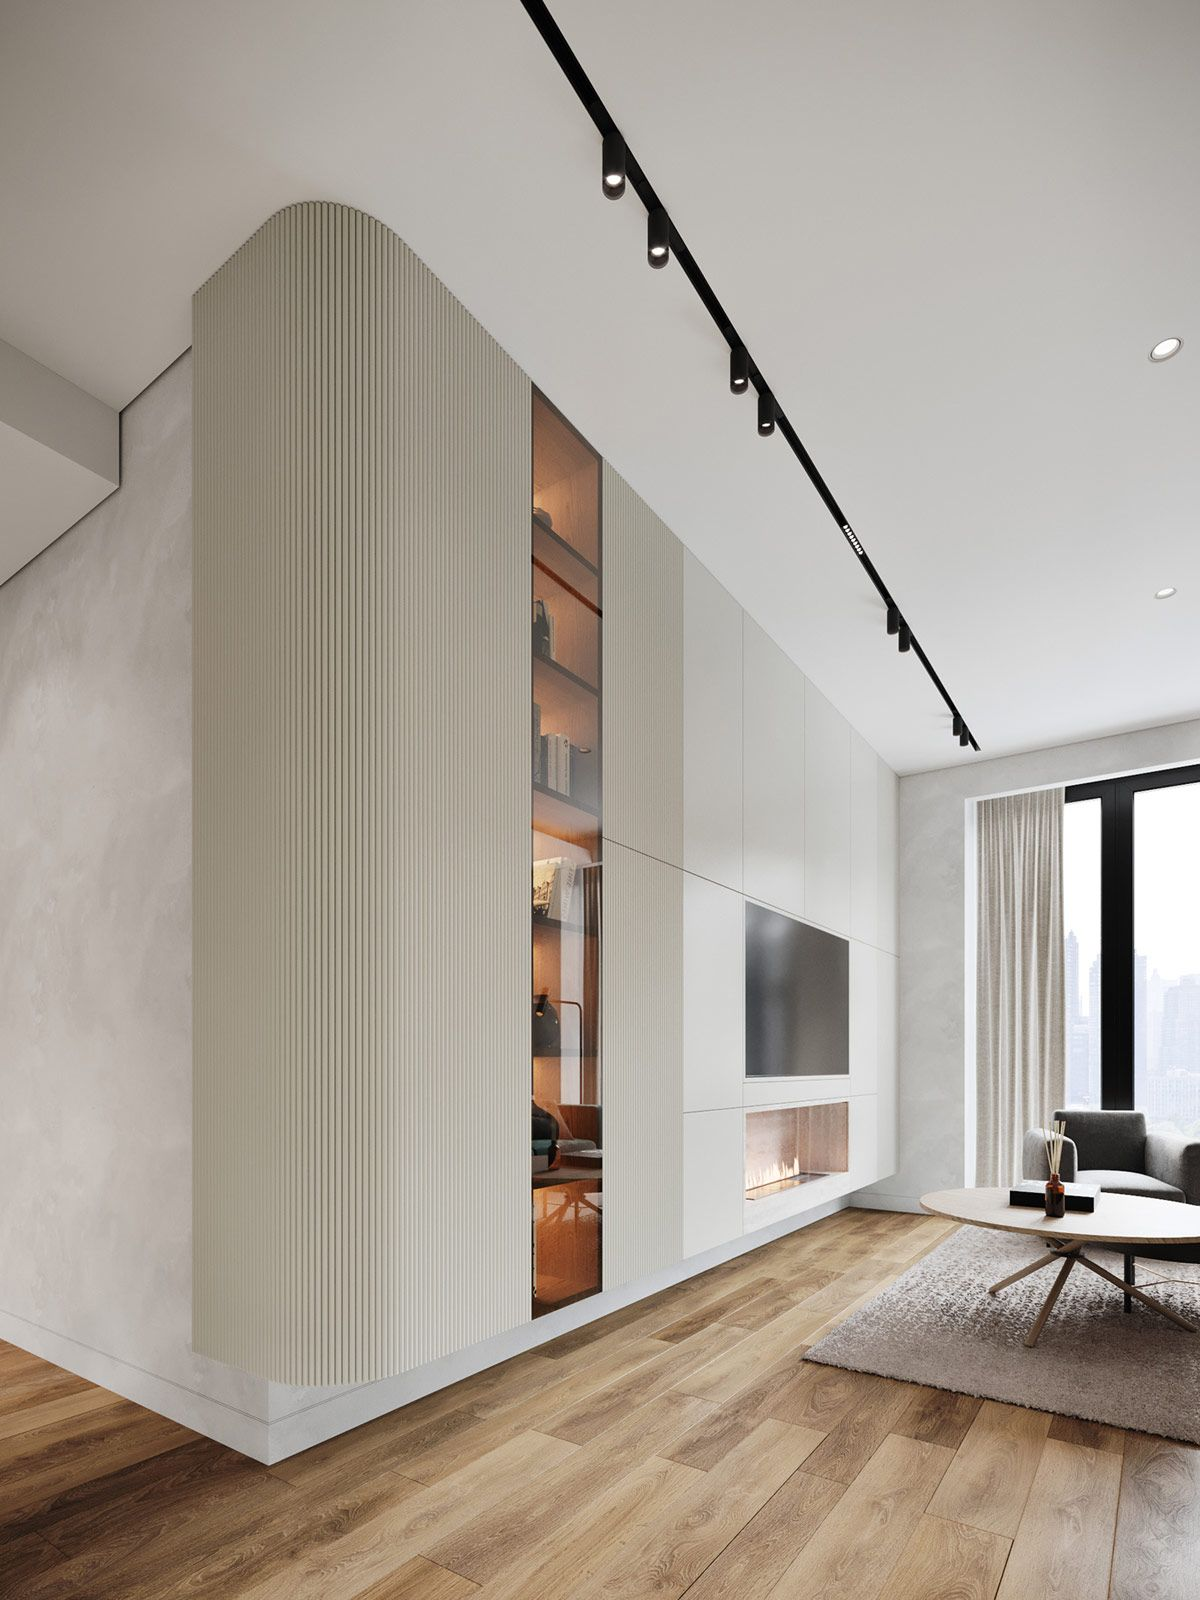 Colouring A Cohesive Home Interior In 2021 Condo Interior Design Condo Interior Modern Bedroom Interior